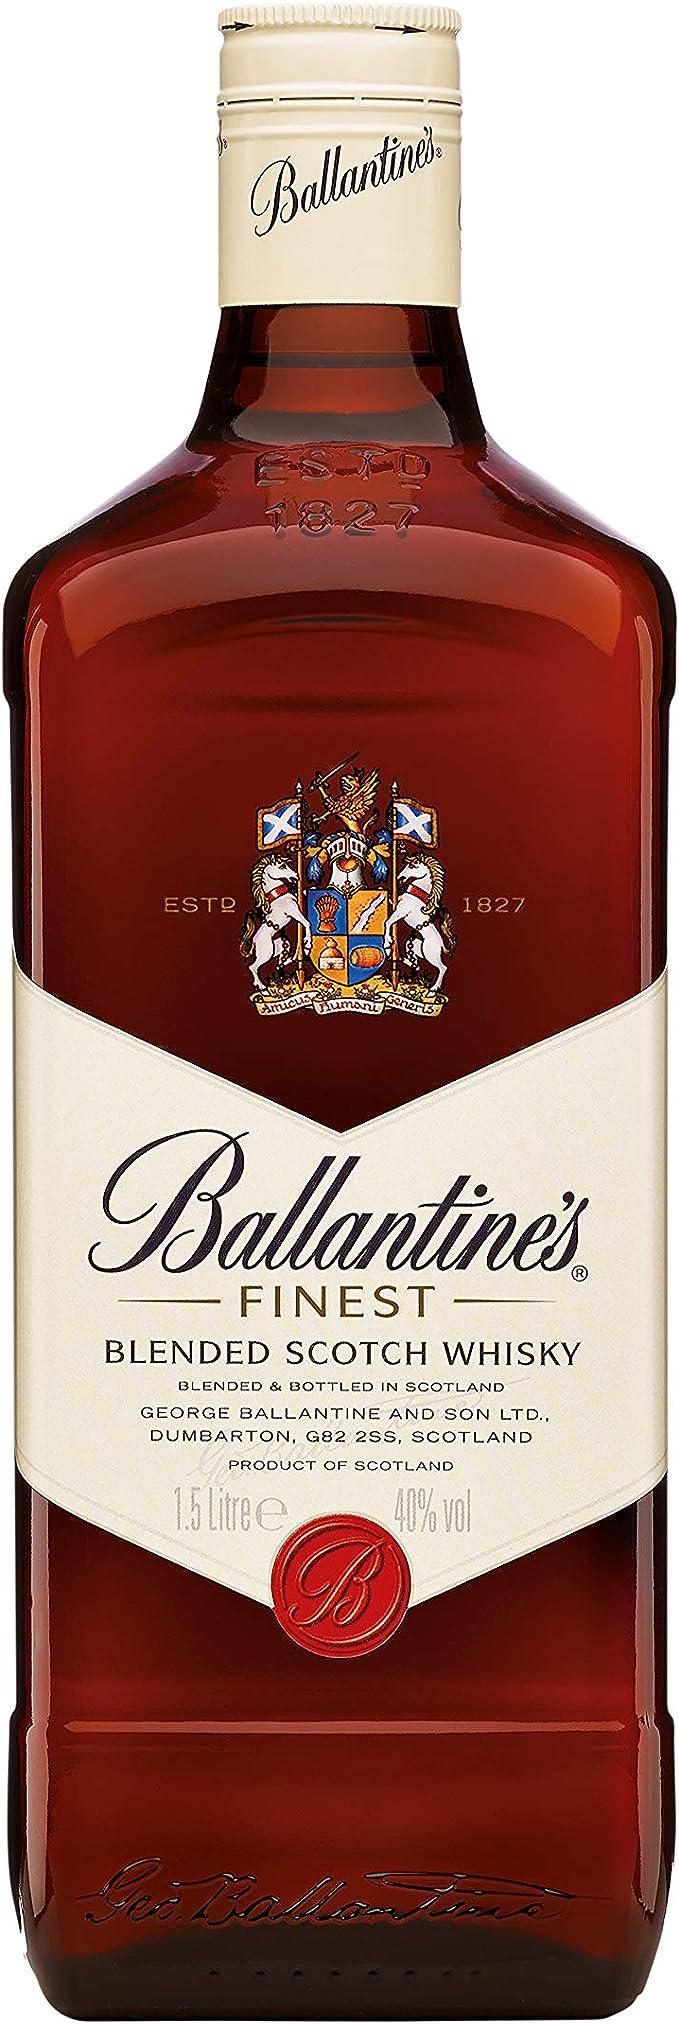 Ballantines Finest Whisky Escocés de Mezcla - 1500 ml